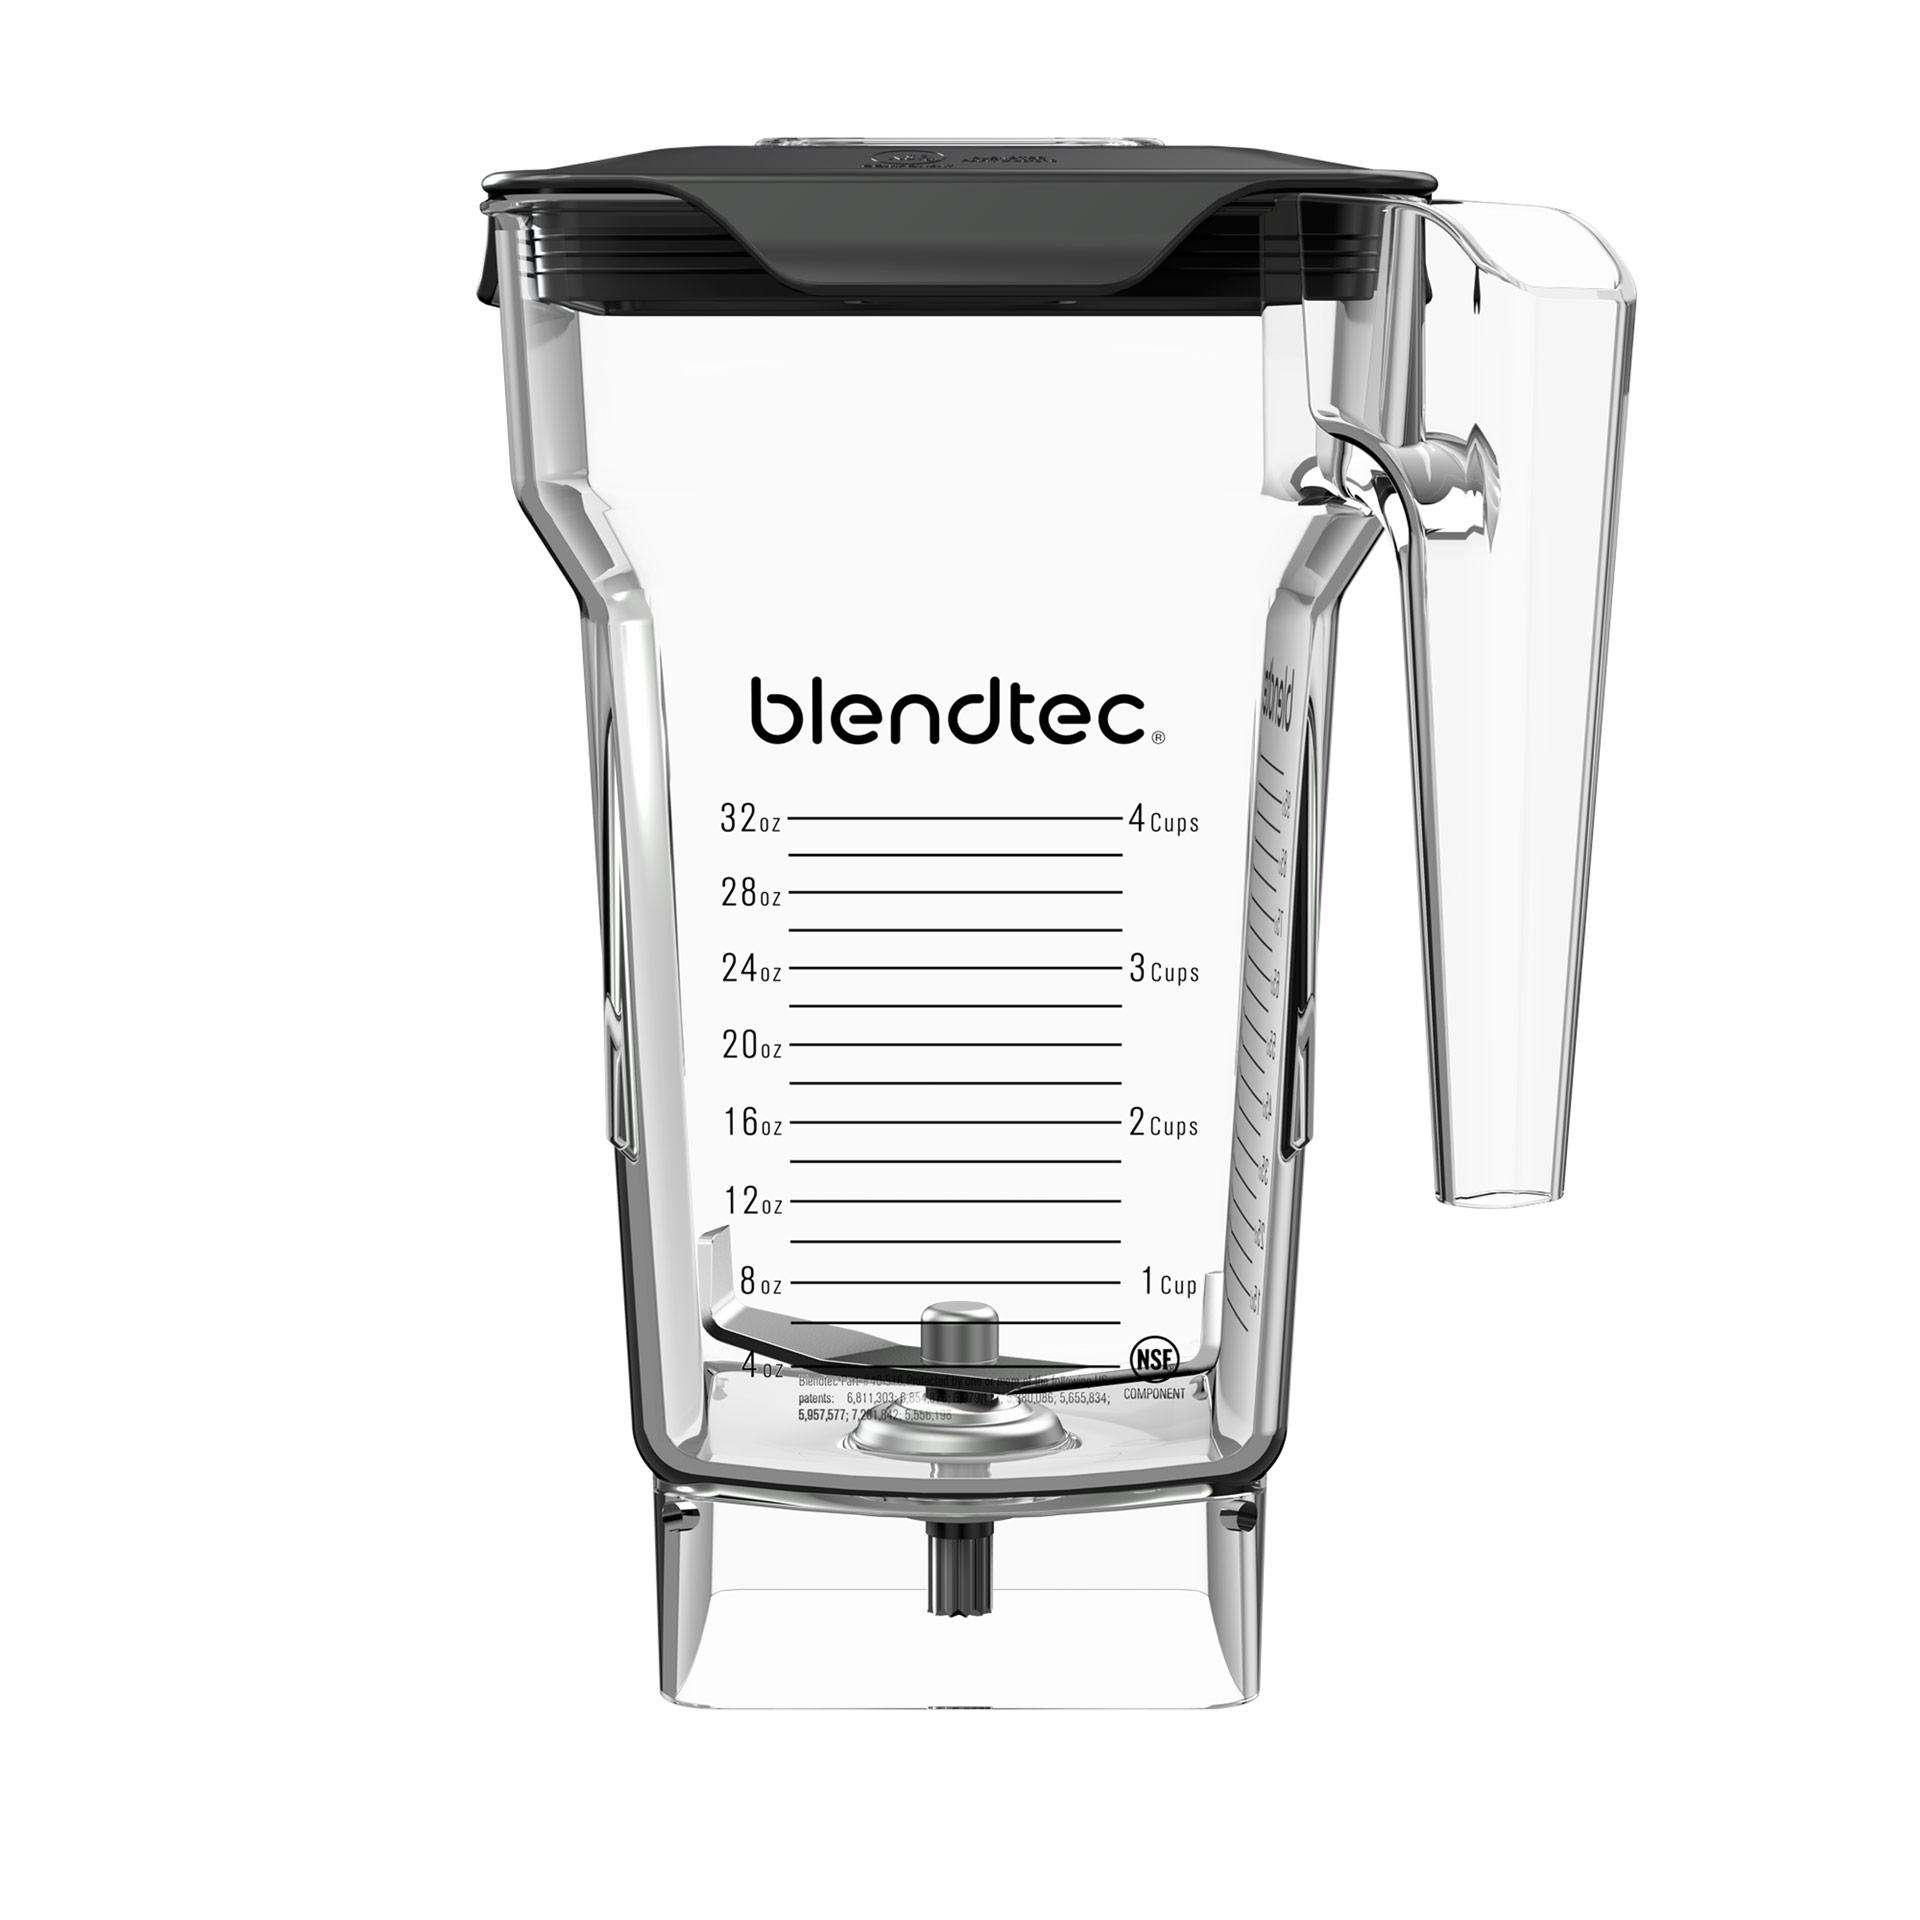 Blendtec FourSide 2-L-Mixbehaelter kompatibel mit allen Blendtec Modellen